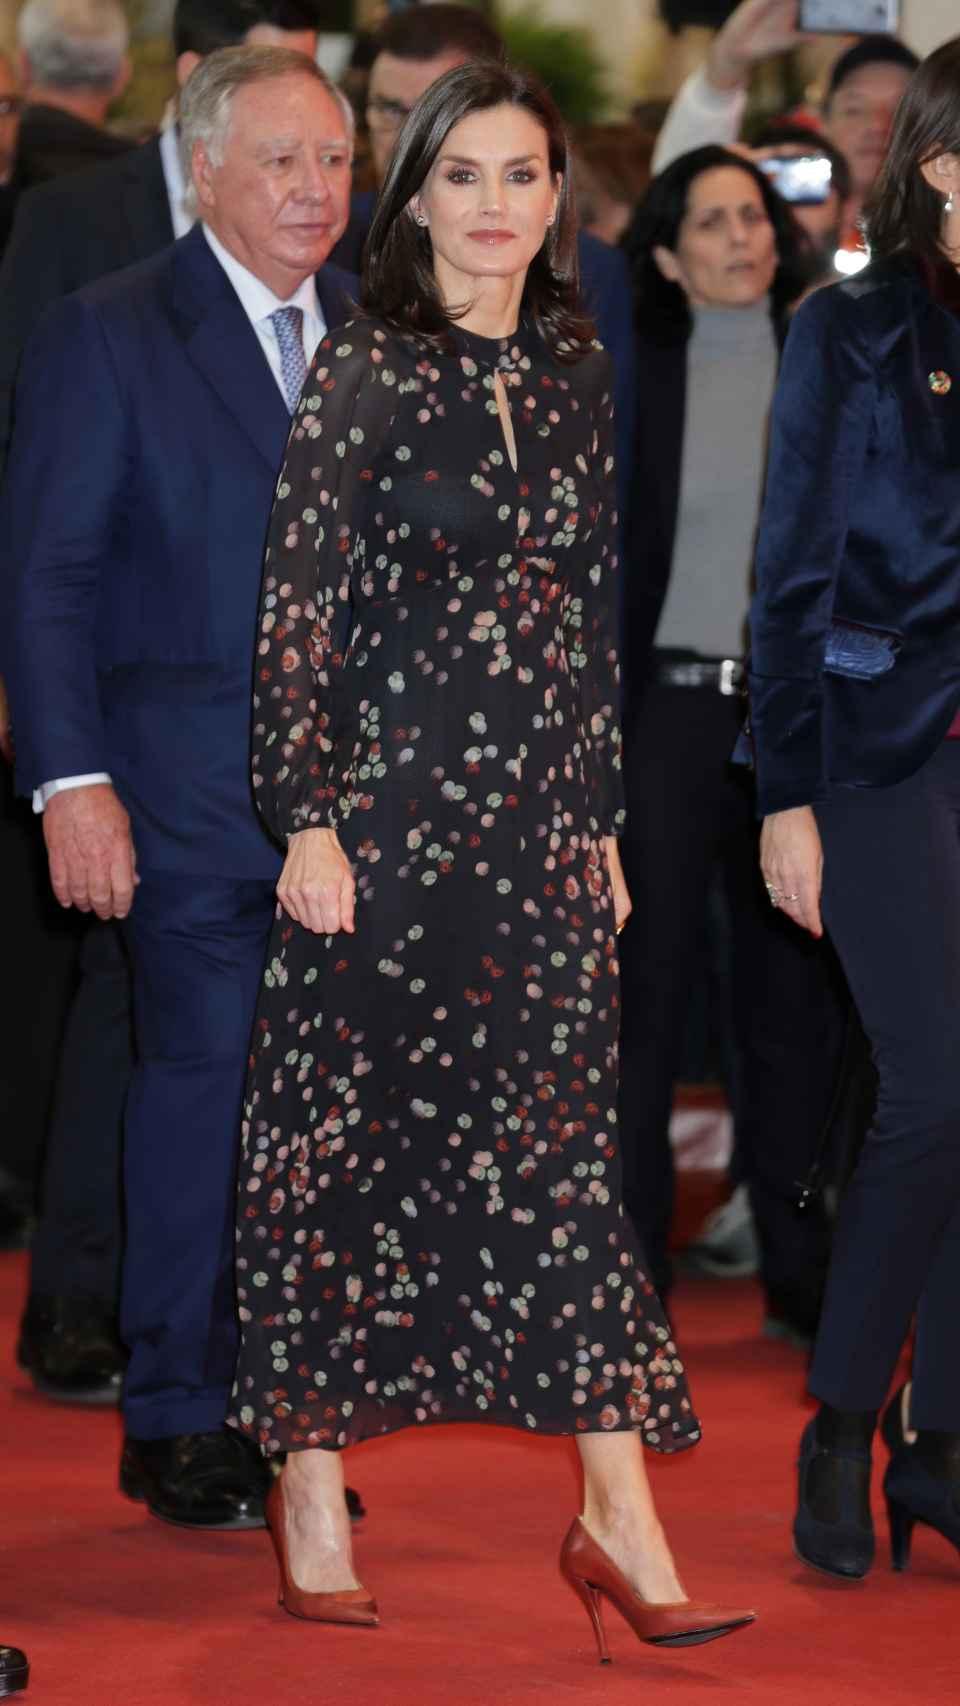 El 'outfit' que ha lucido la Reina esta mañana.